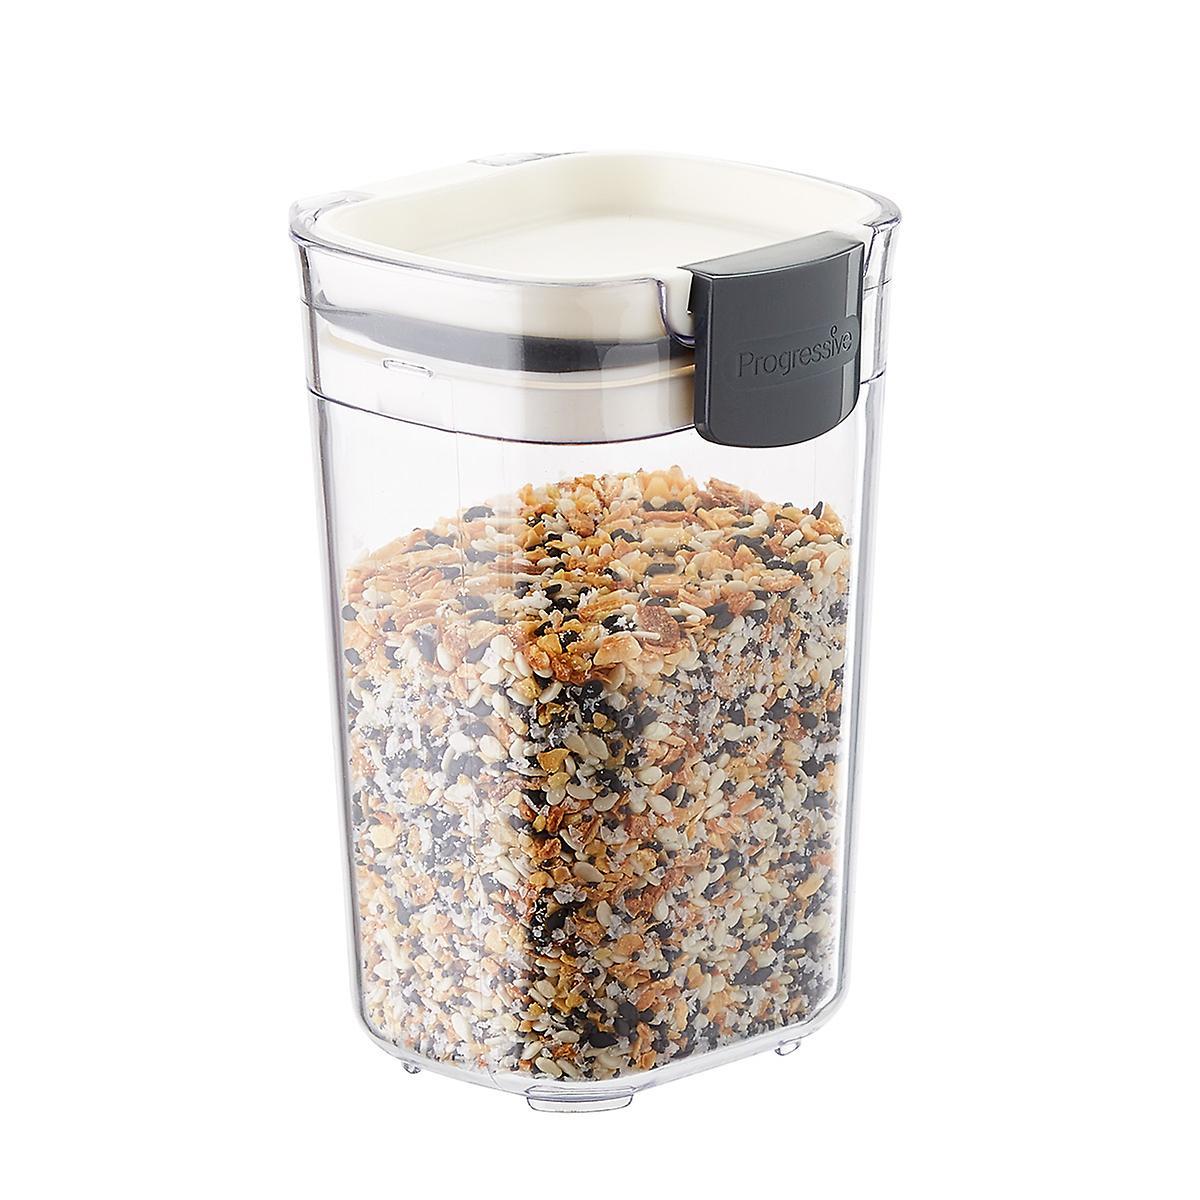 ProKeeper 5 oz. Seasoning Container